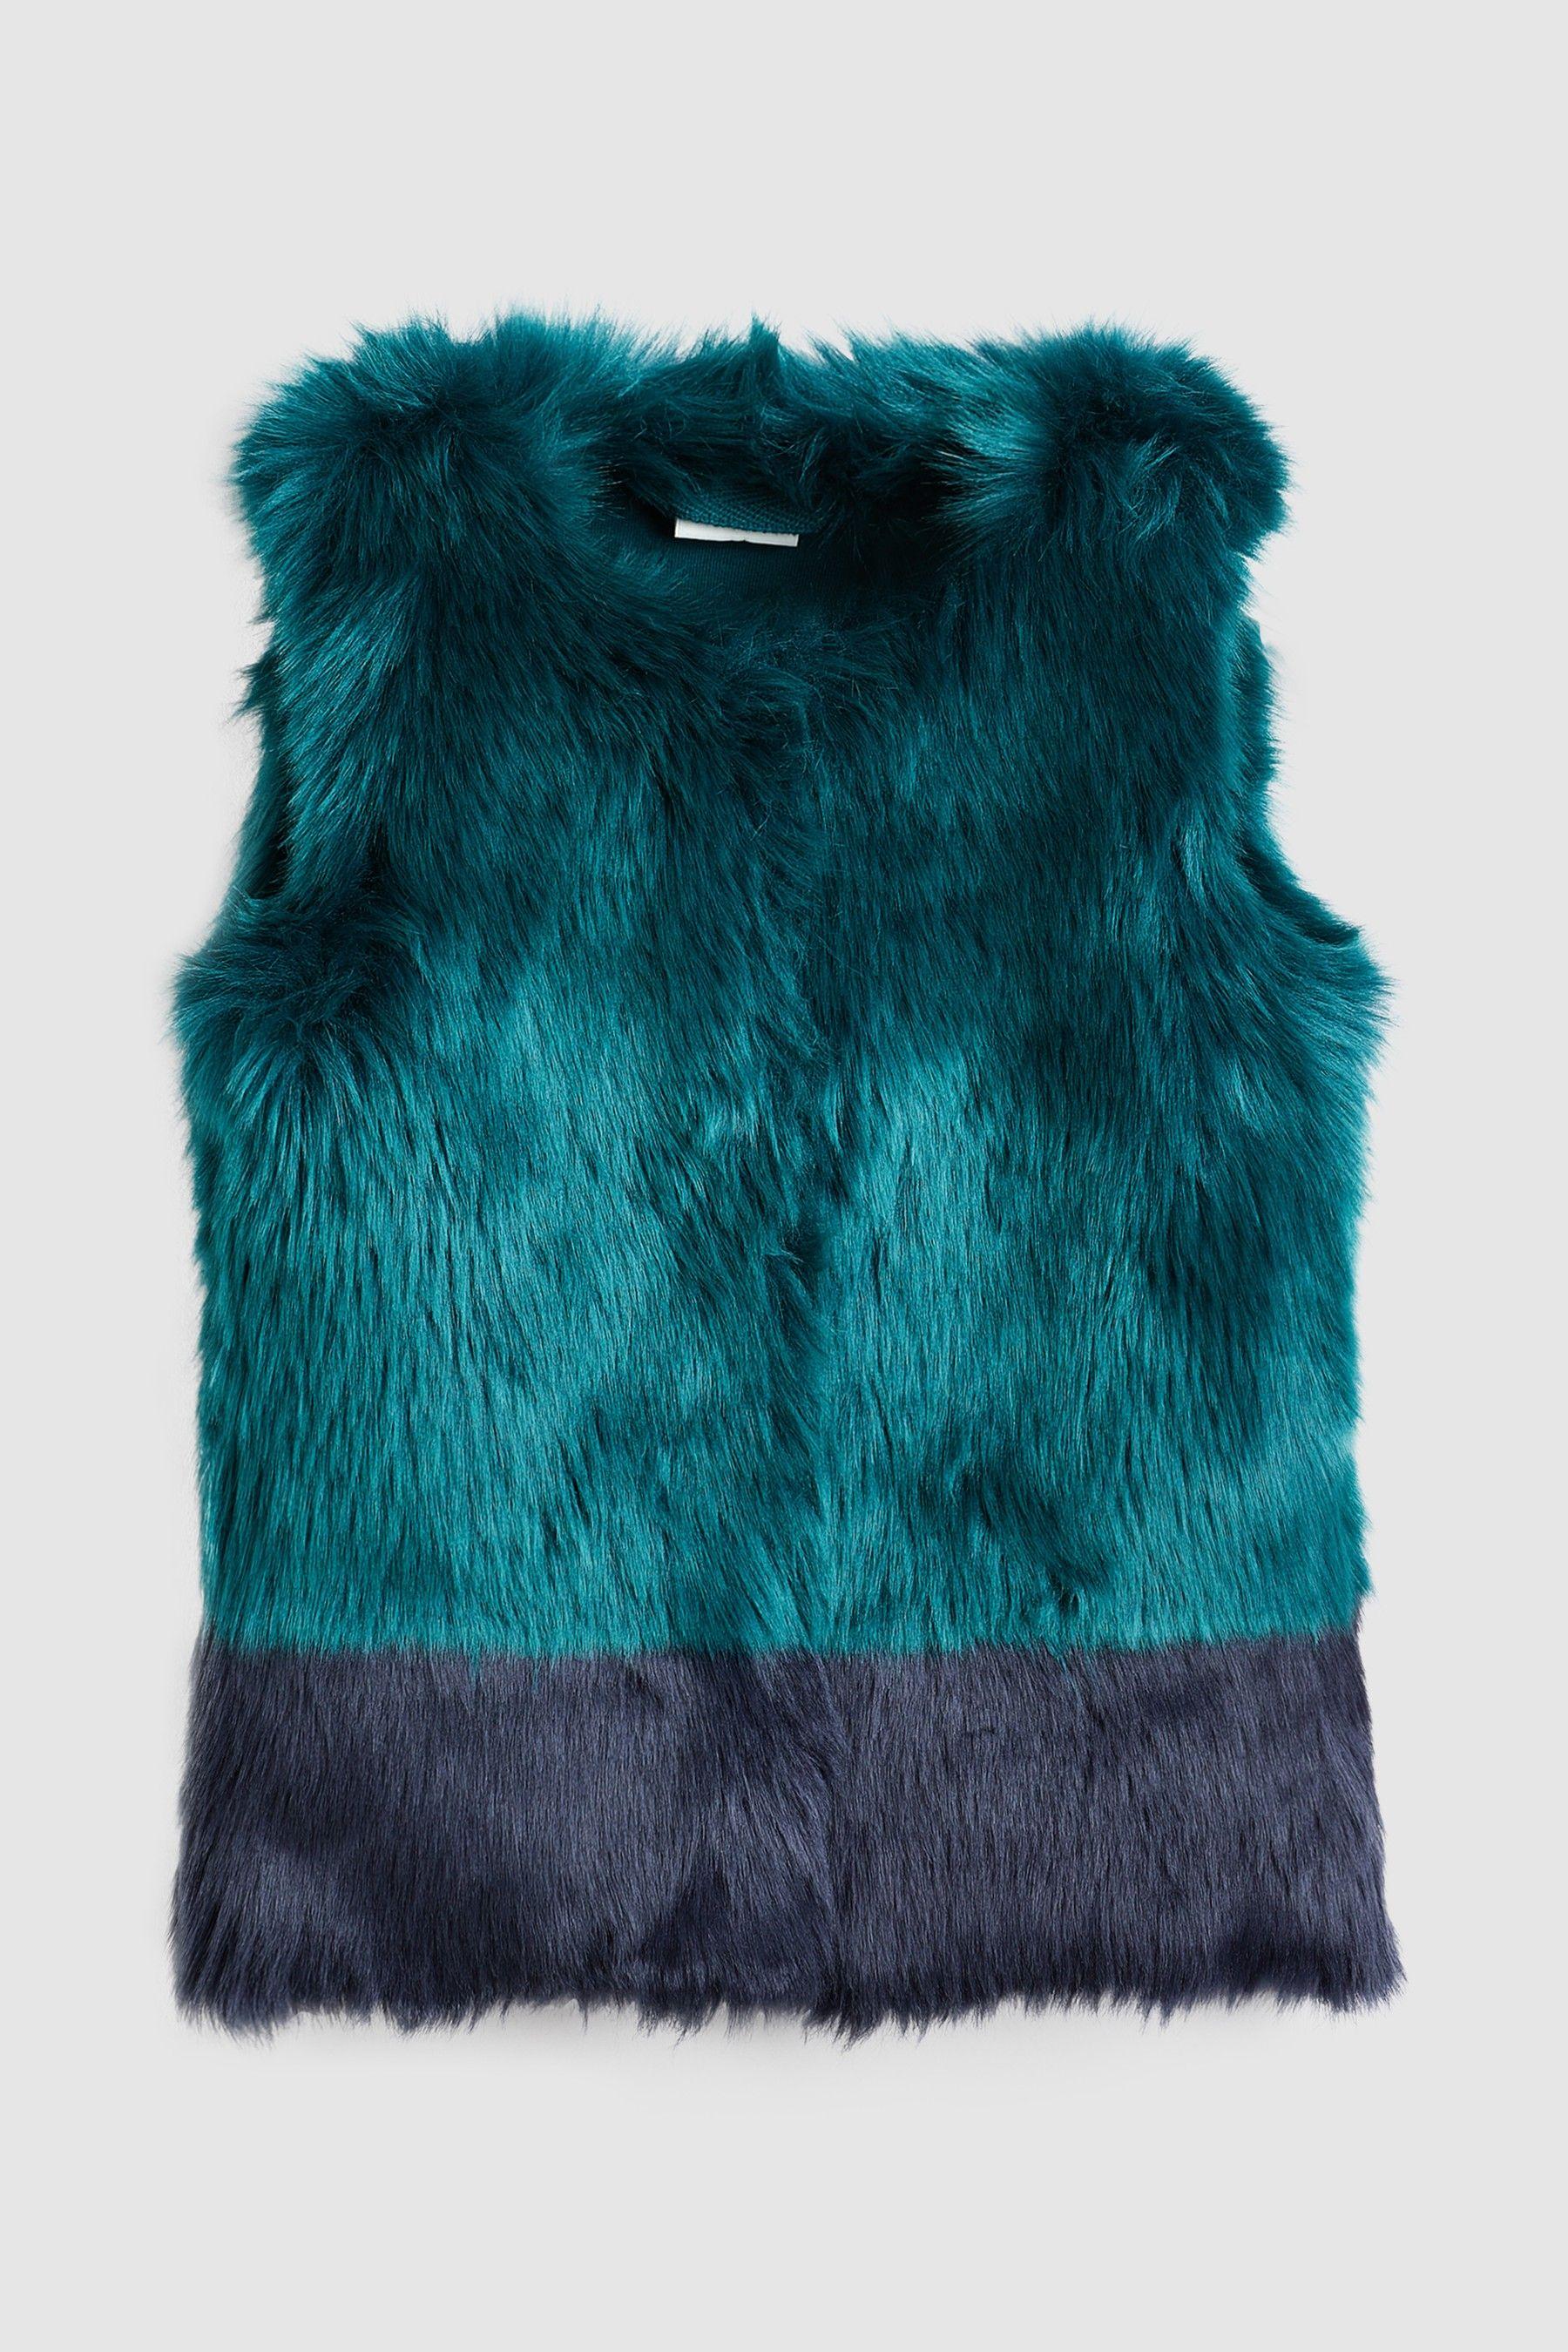 f6ec3c6a Girls Next Teal/Navy Colourblock Faux Fur Gilet (12mths-6yrs) - Blue ...